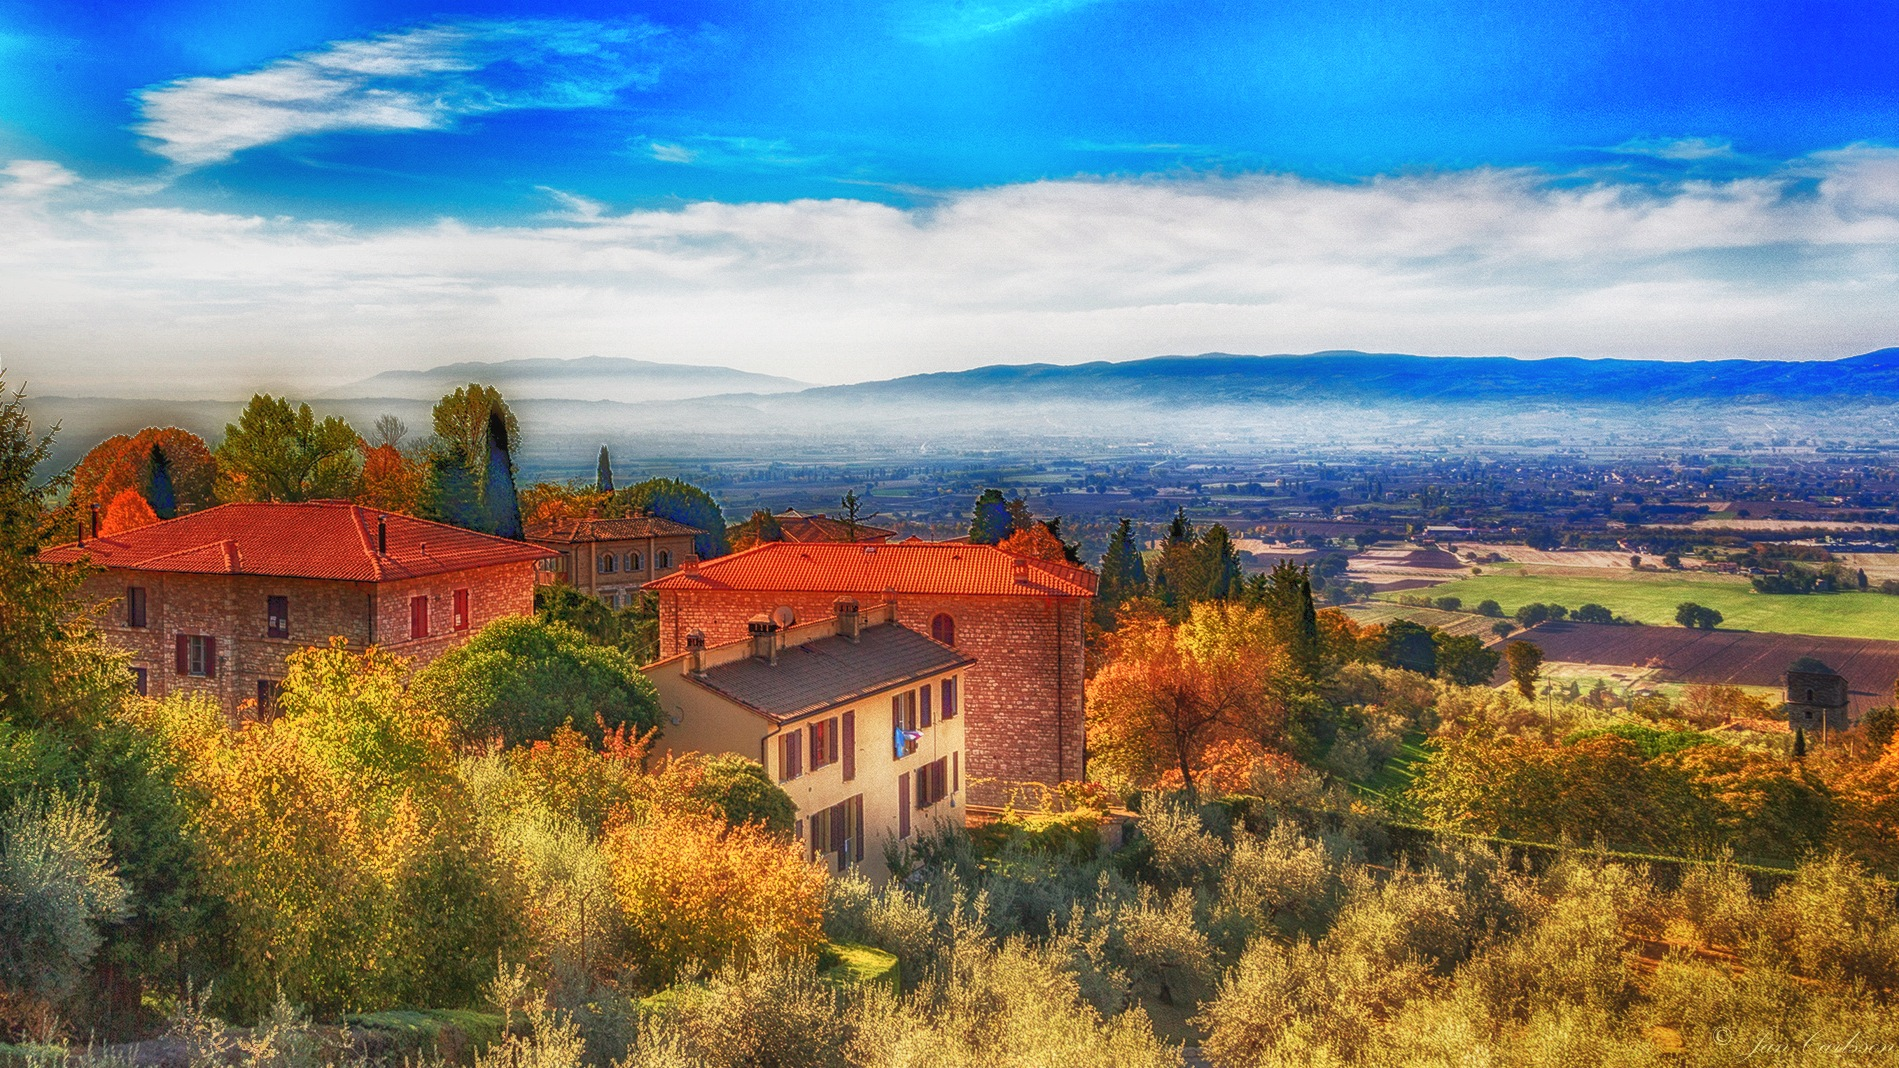 Assisi HDR by carljan w carlsson